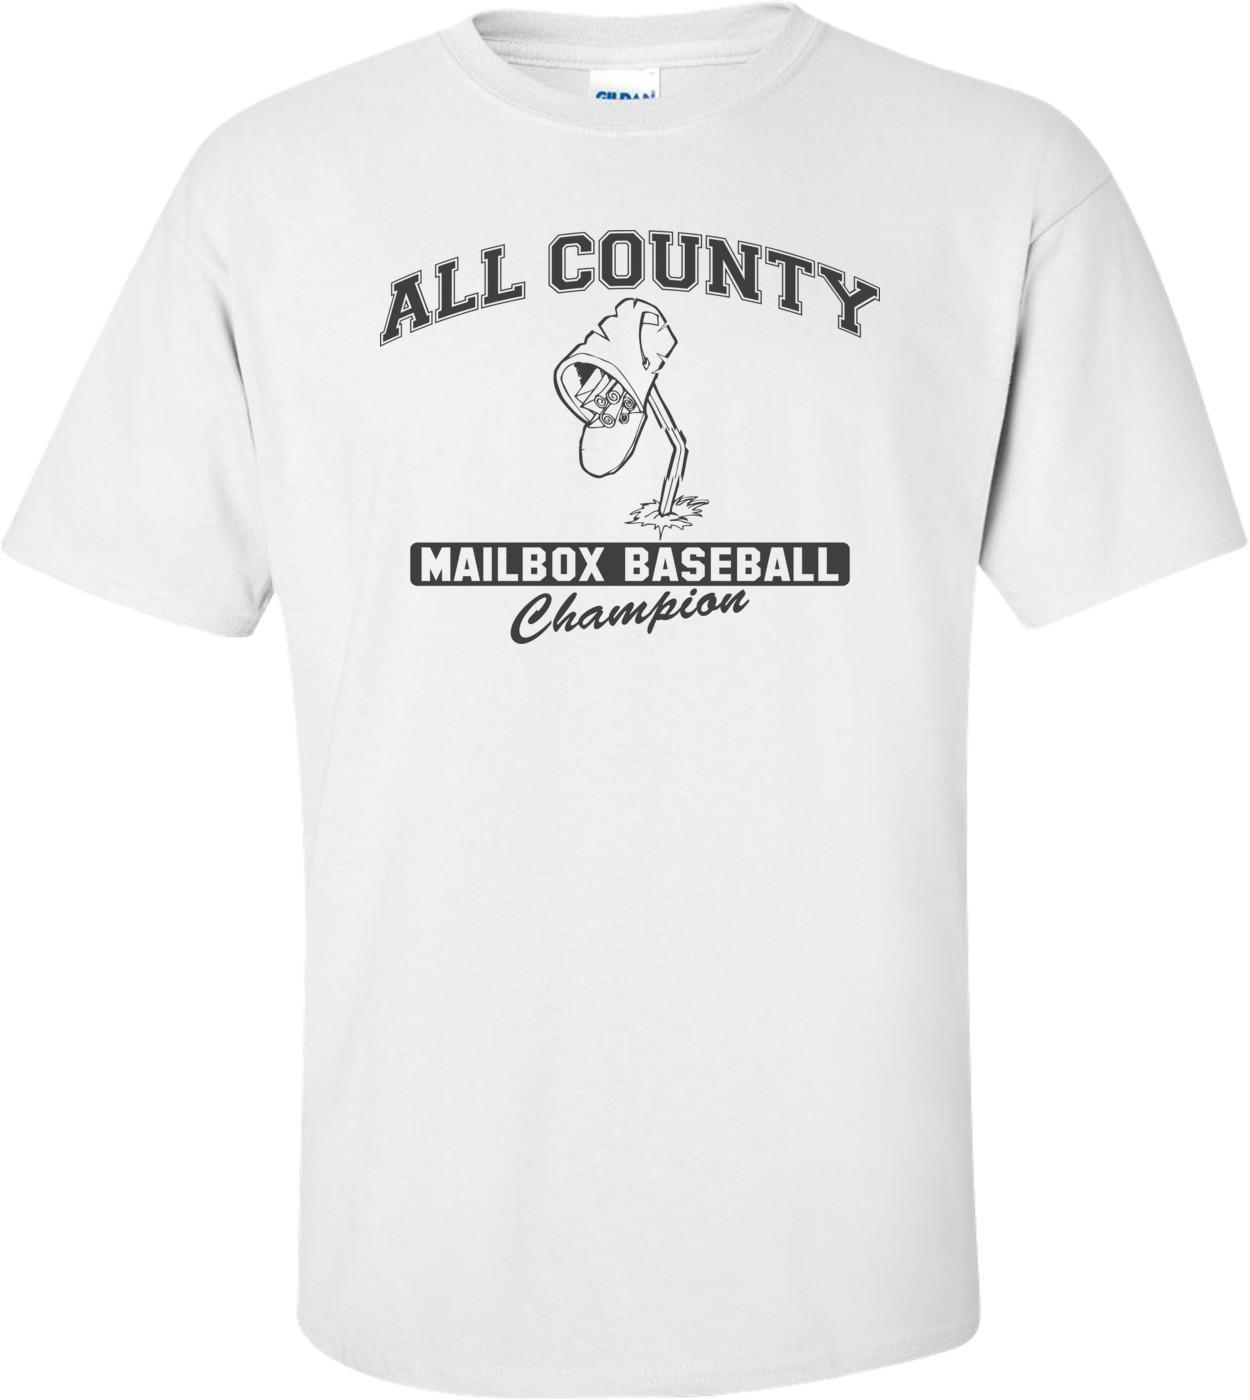 All County Mailbox Baseball Champion T-shirt